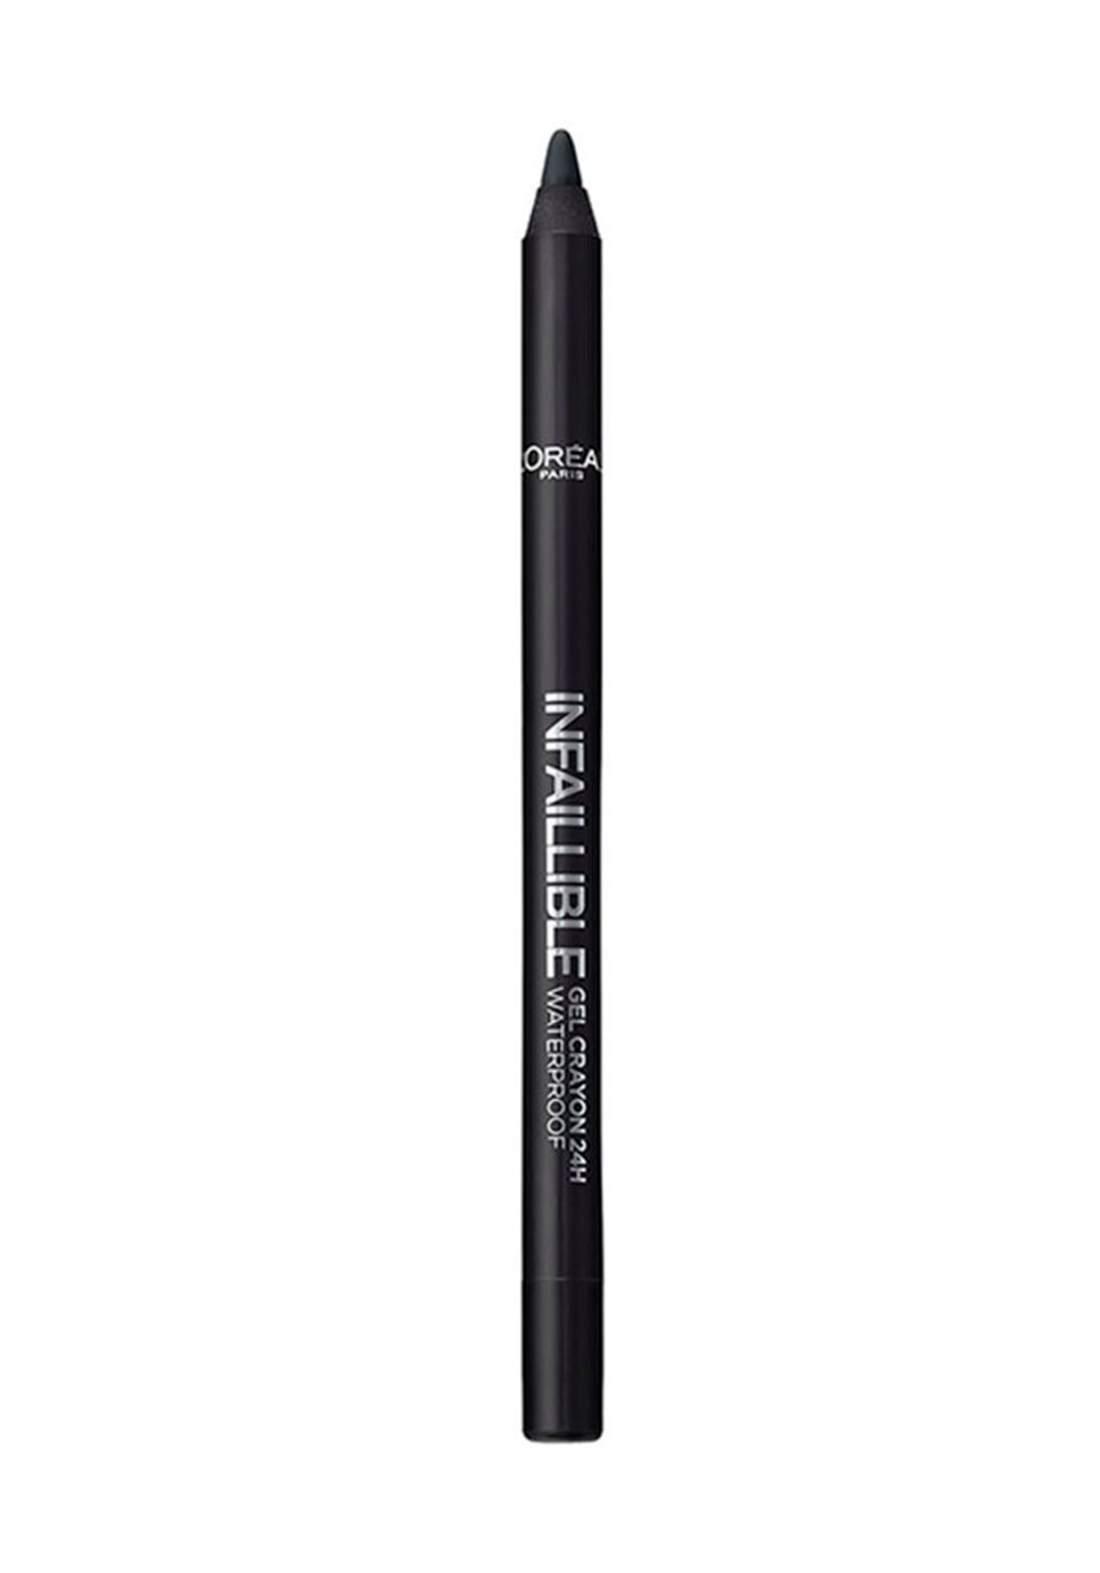 L'Oreal Paris Infallible Gel Crayon Eyeliner 01 Back  (027-0833) قلم تحديد العيون